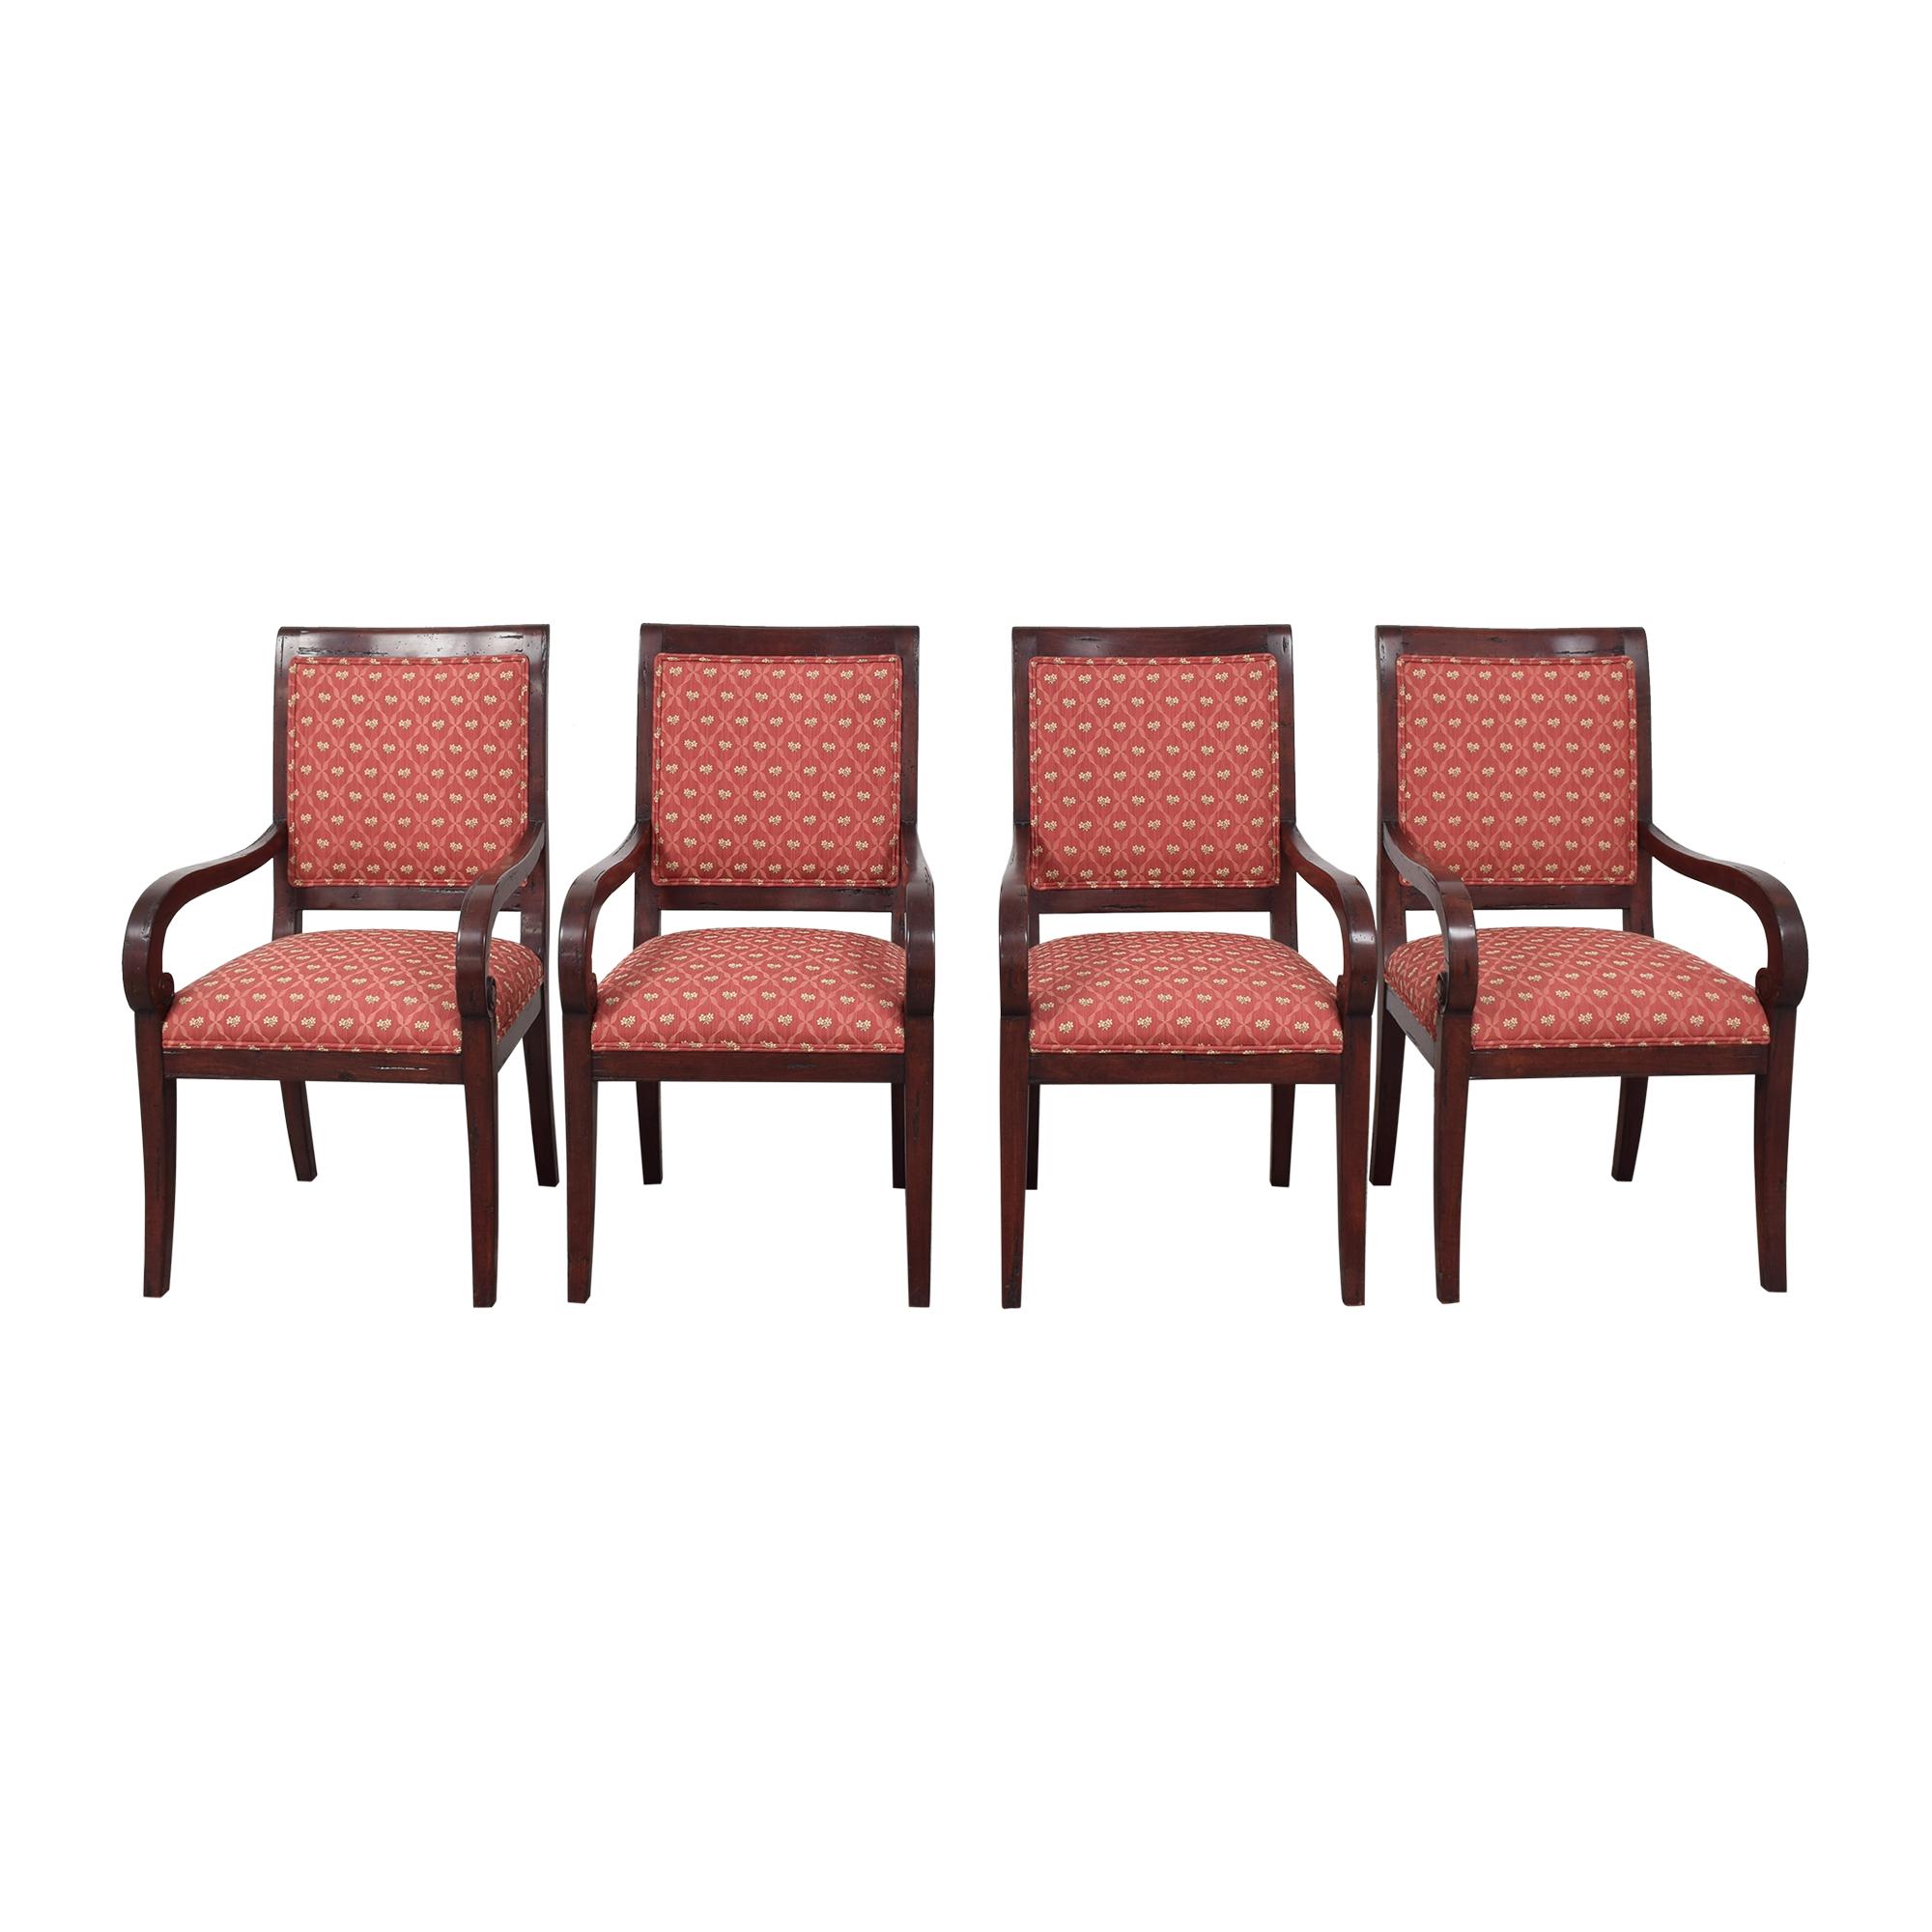 Guy Chaddock & Co. Custom Fordham Dining Arm Chairs / Chairs